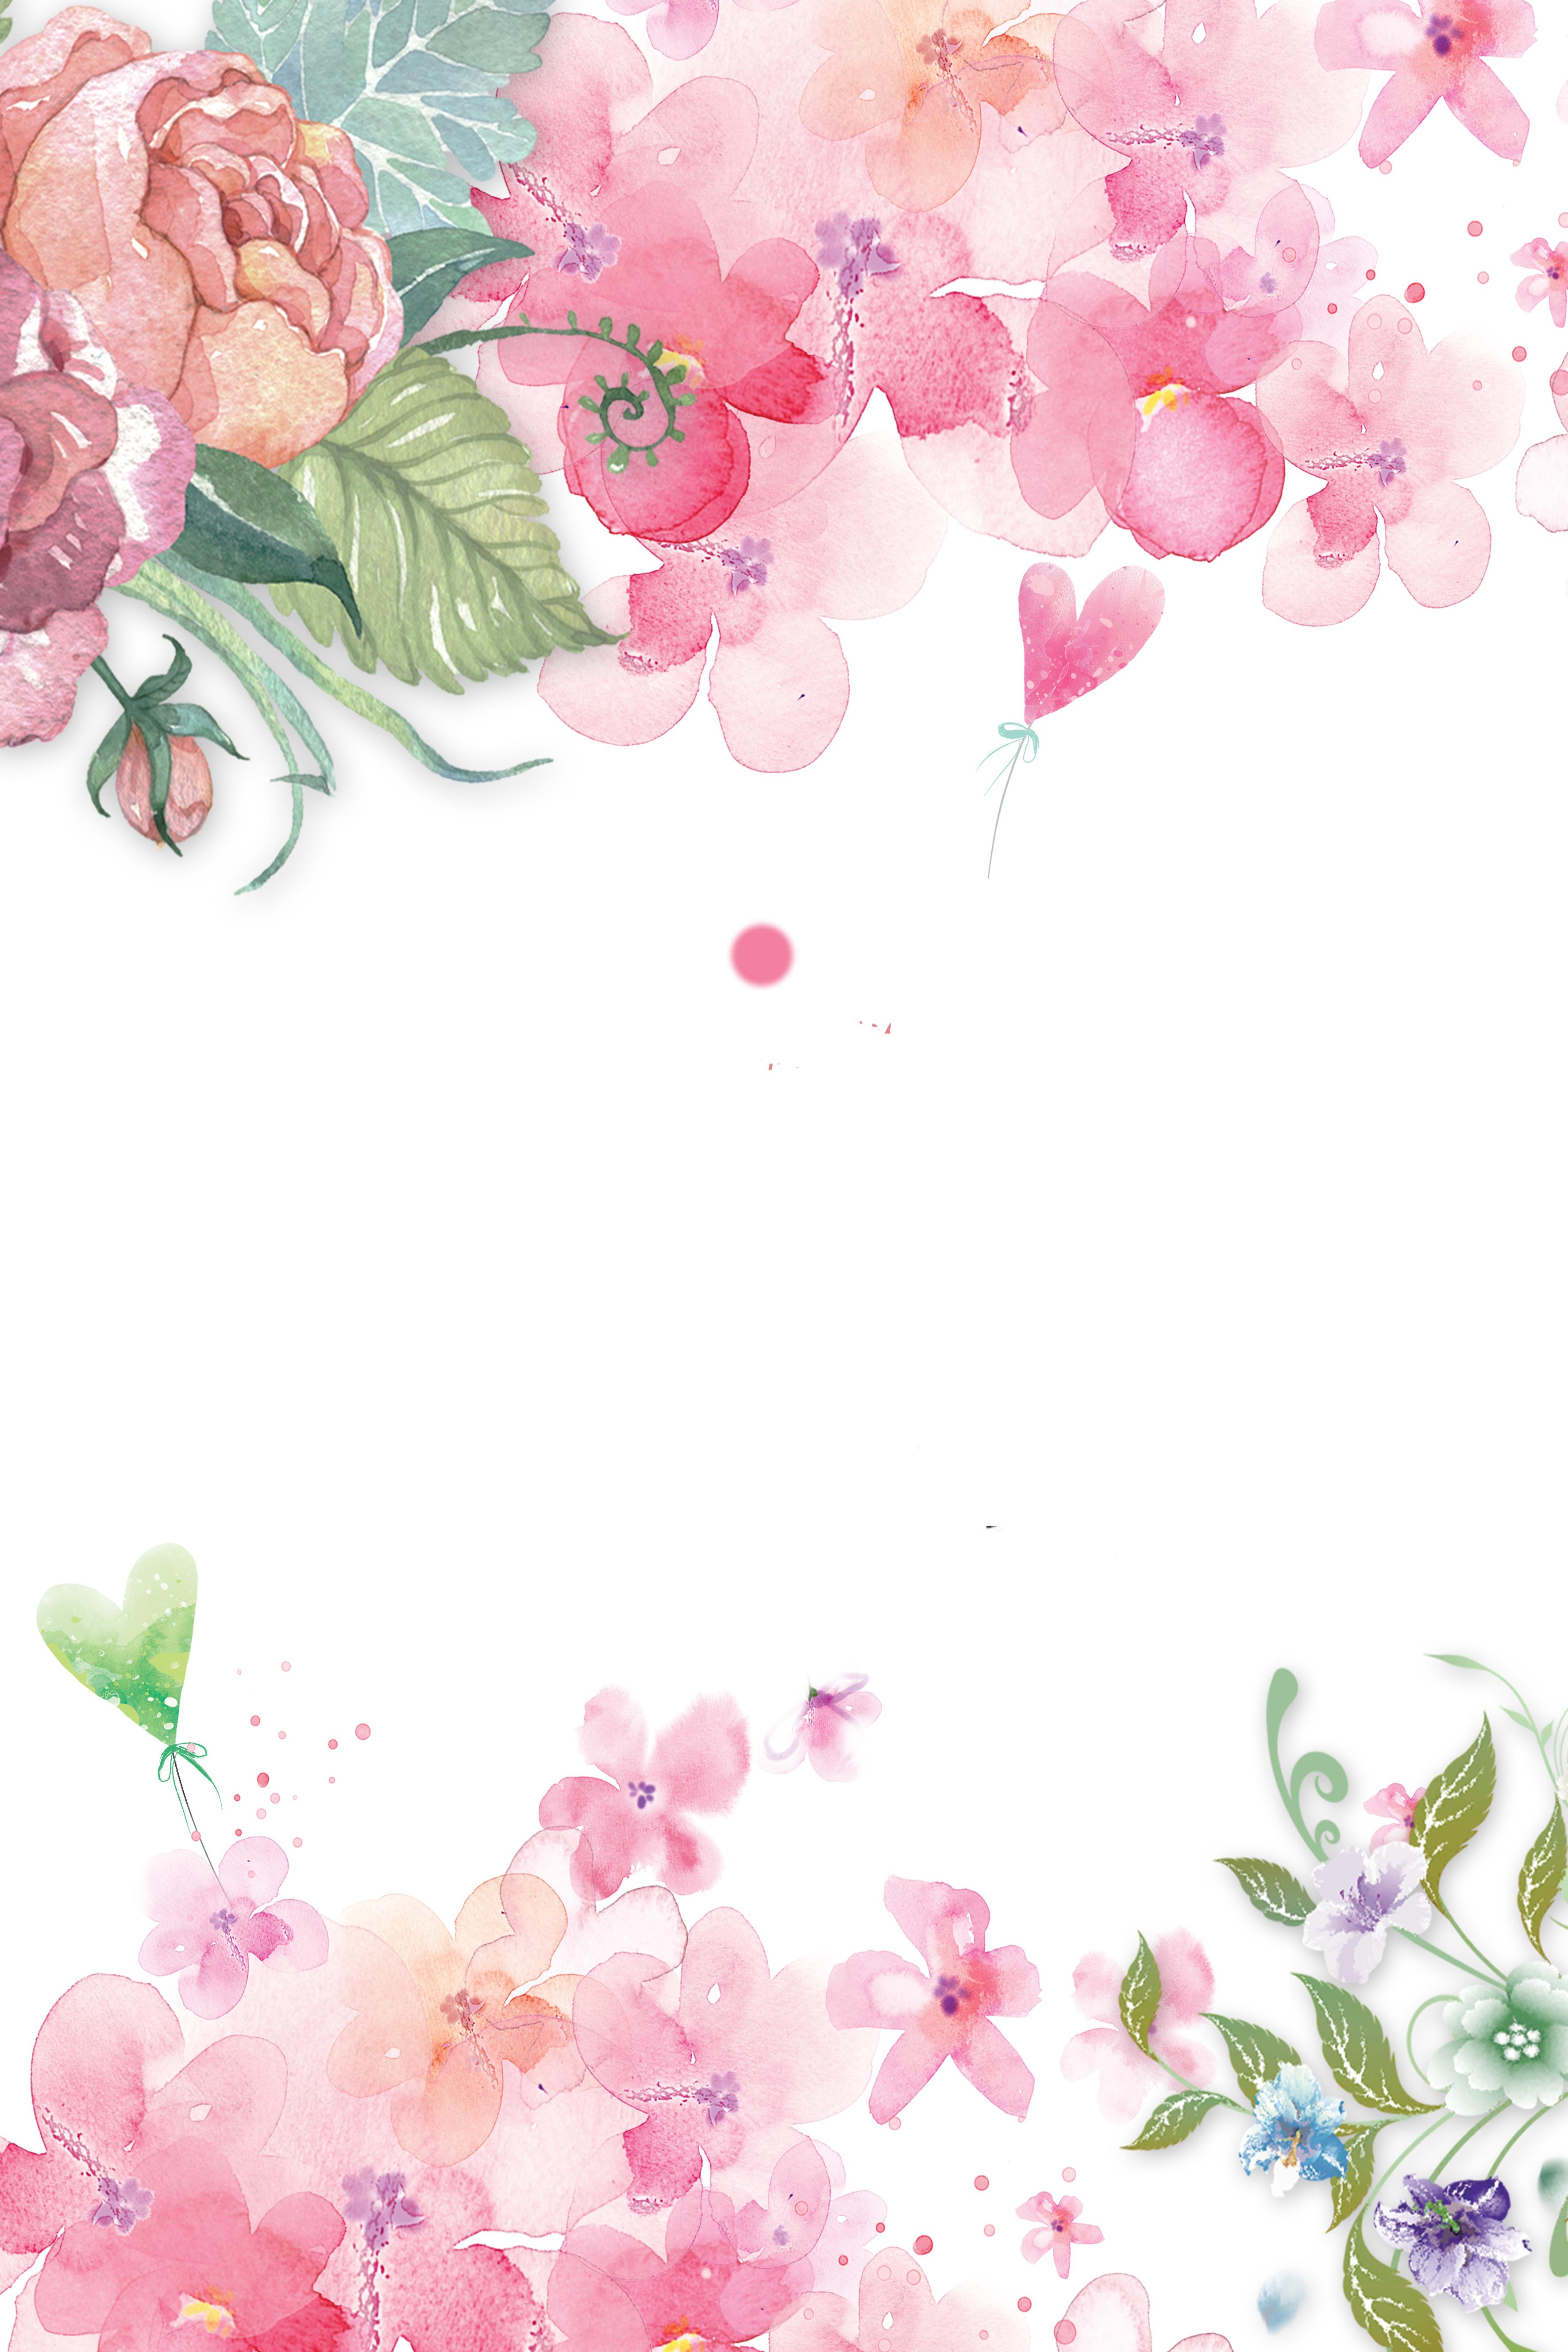 beautiful flowers watercolor poster background  beautiful